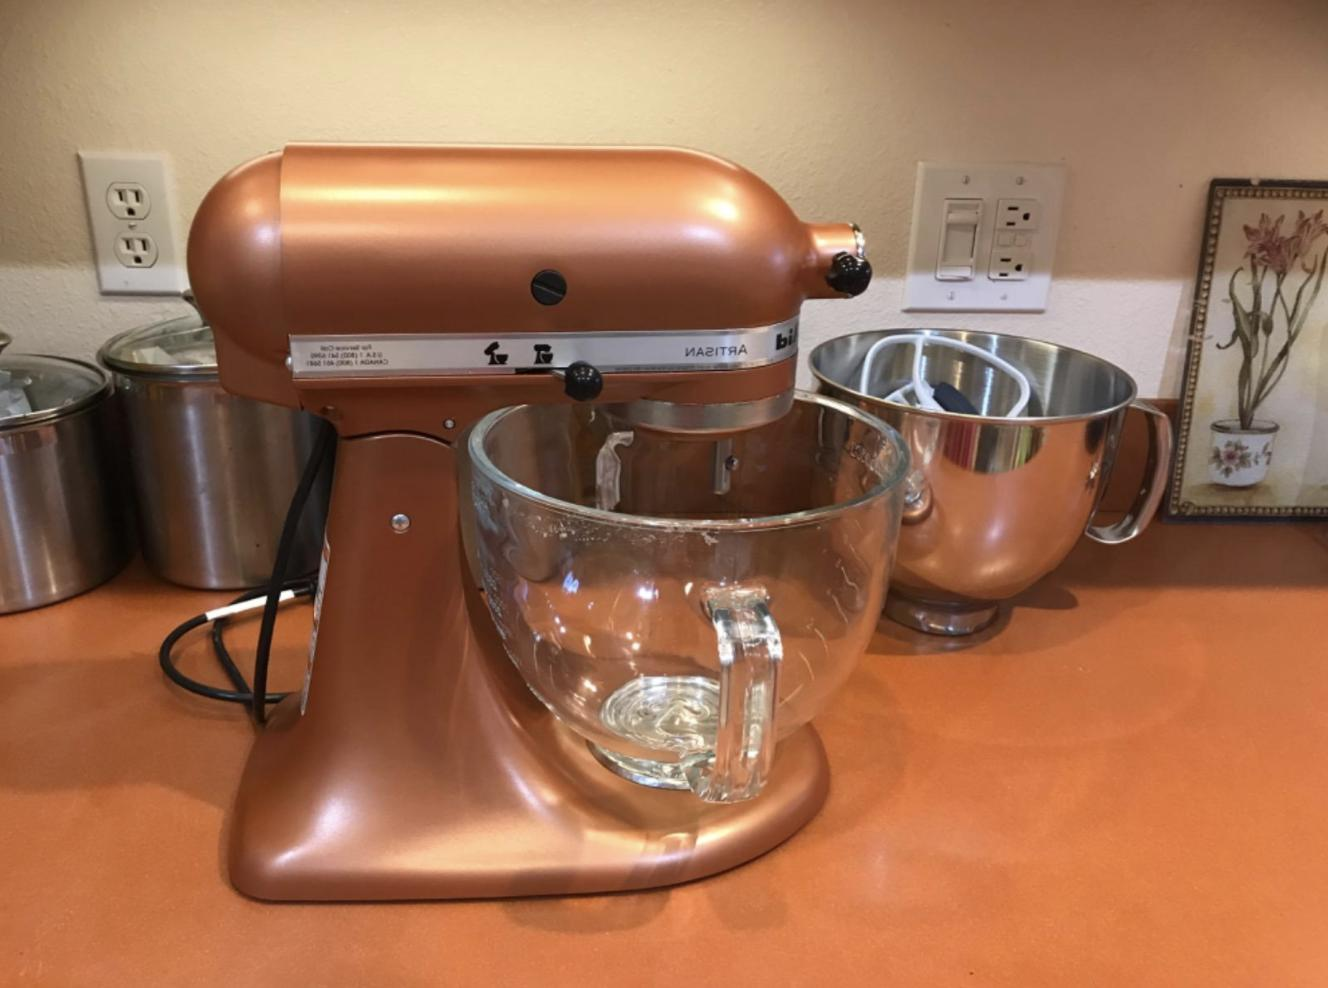 KitchenAid Stand 5 quart Glass Measurement Markings